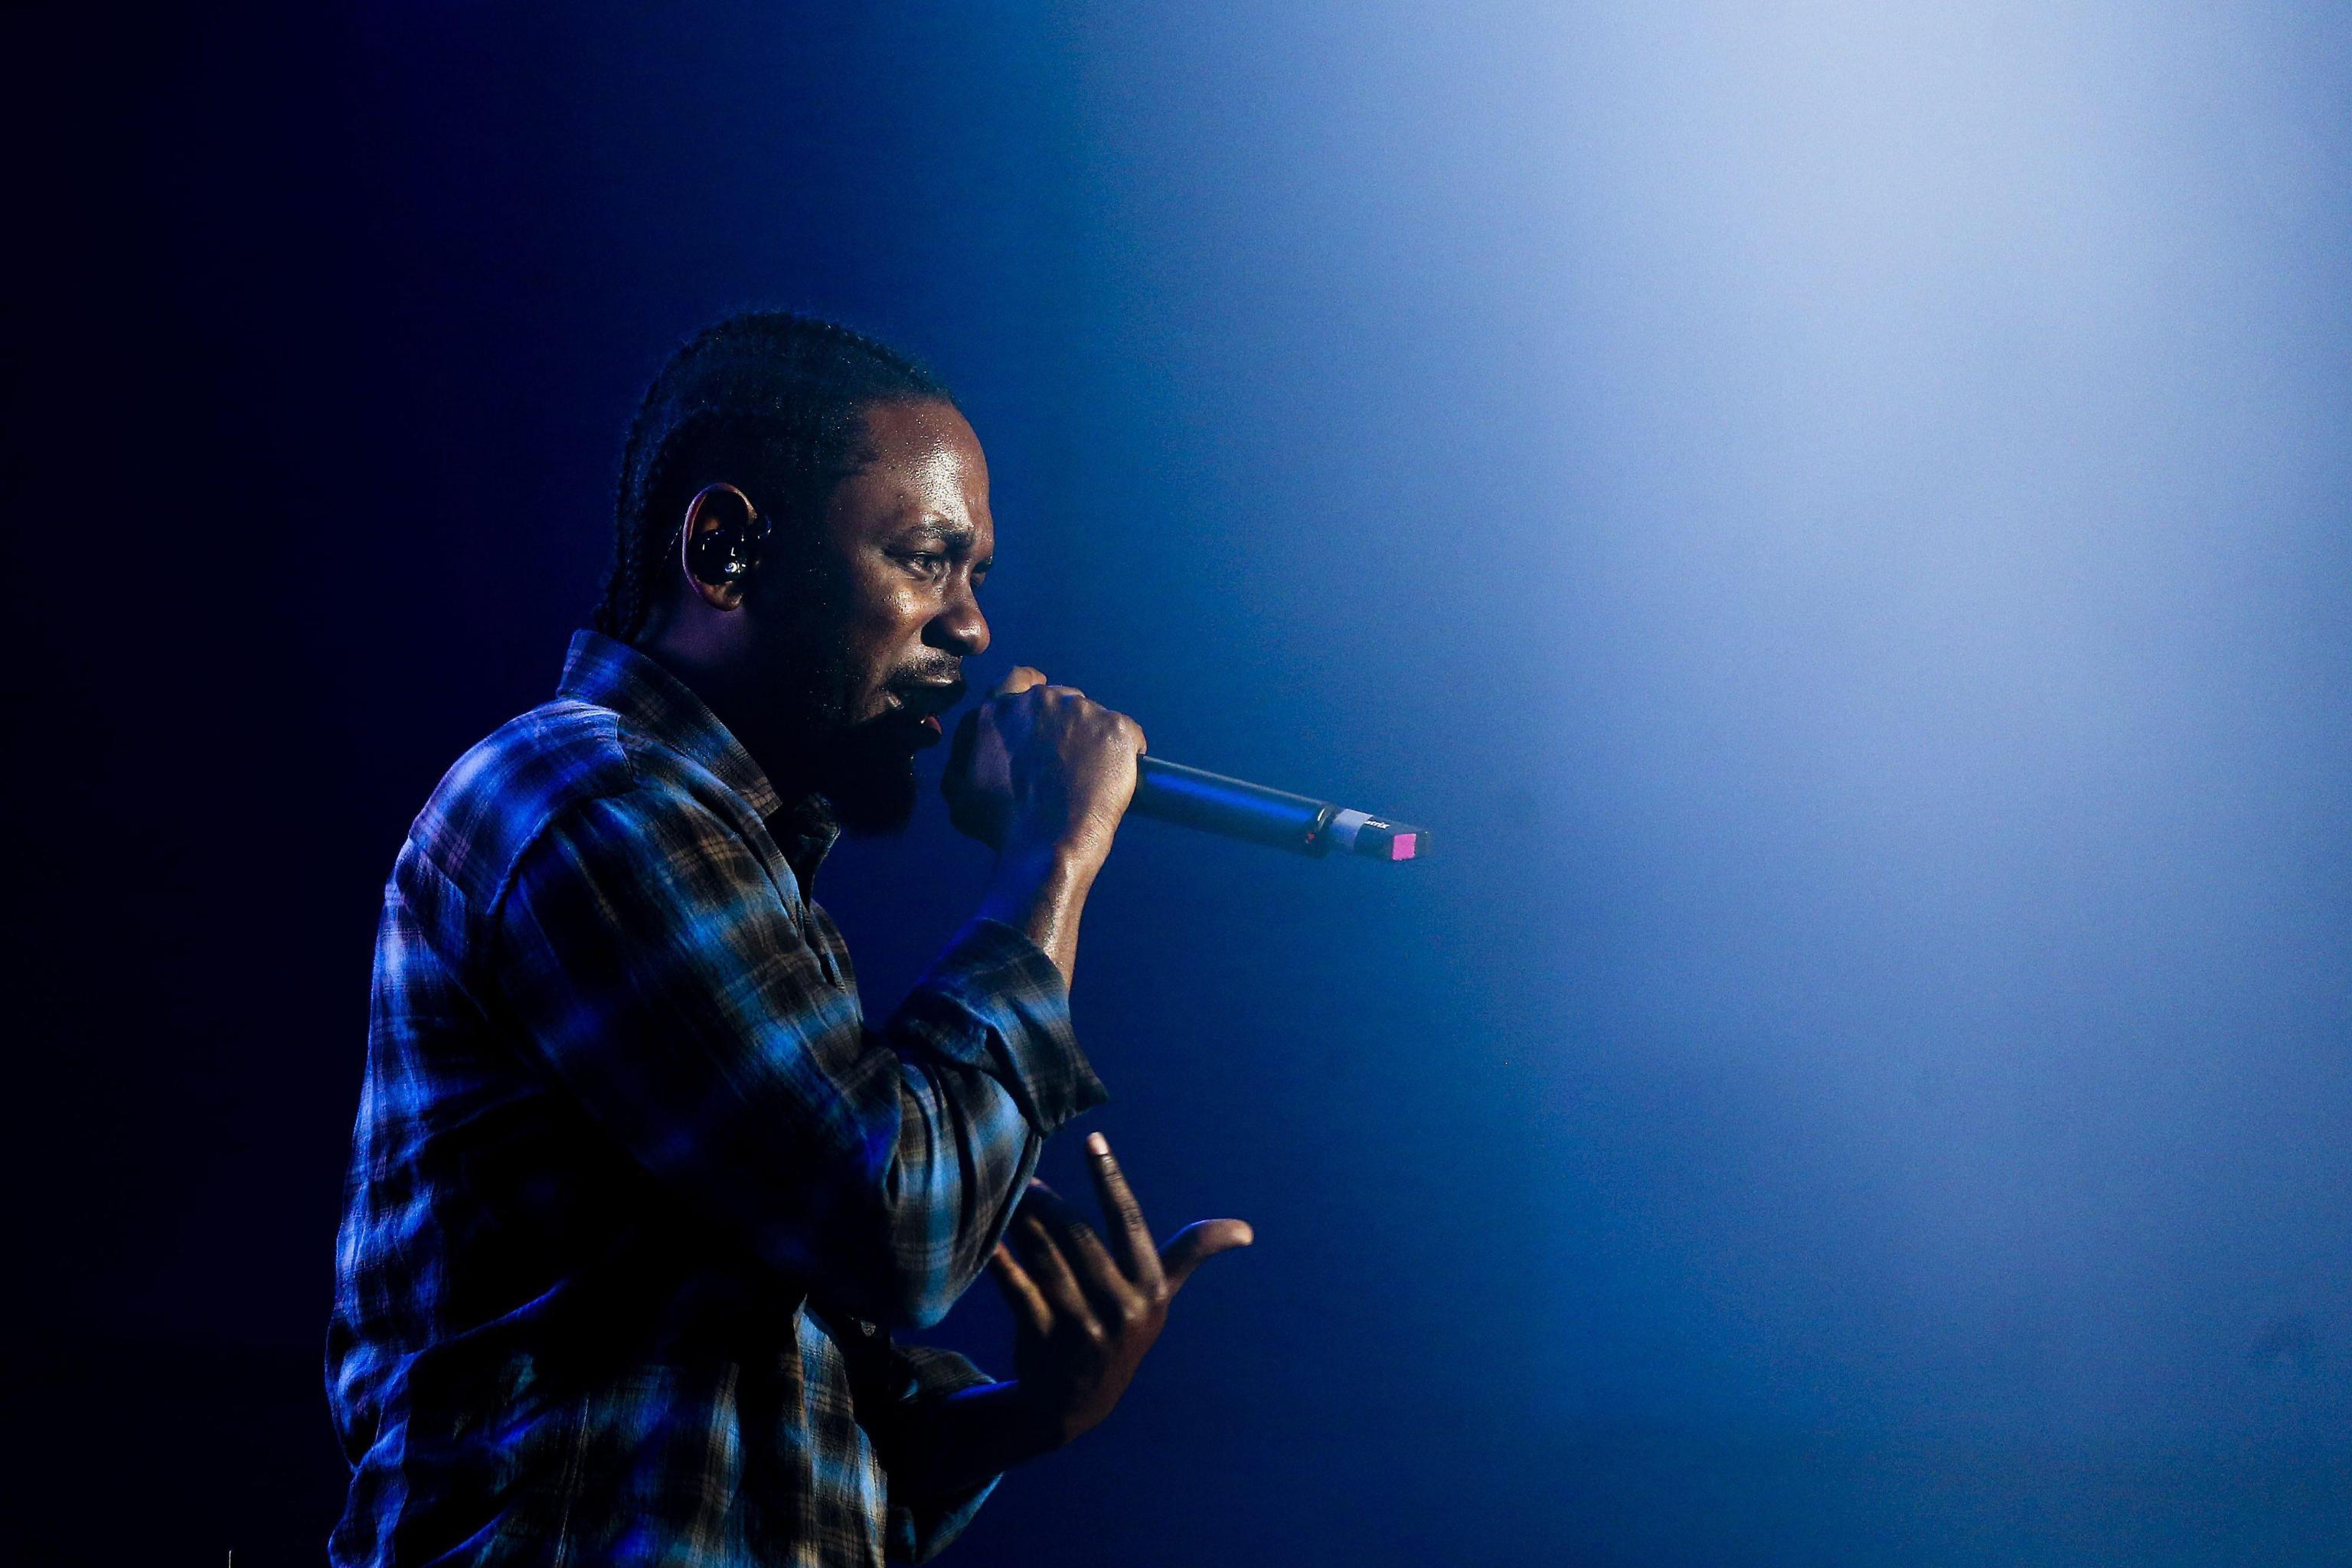 Premio Pulitzer 2018 per la musica a Kendrick Lamar